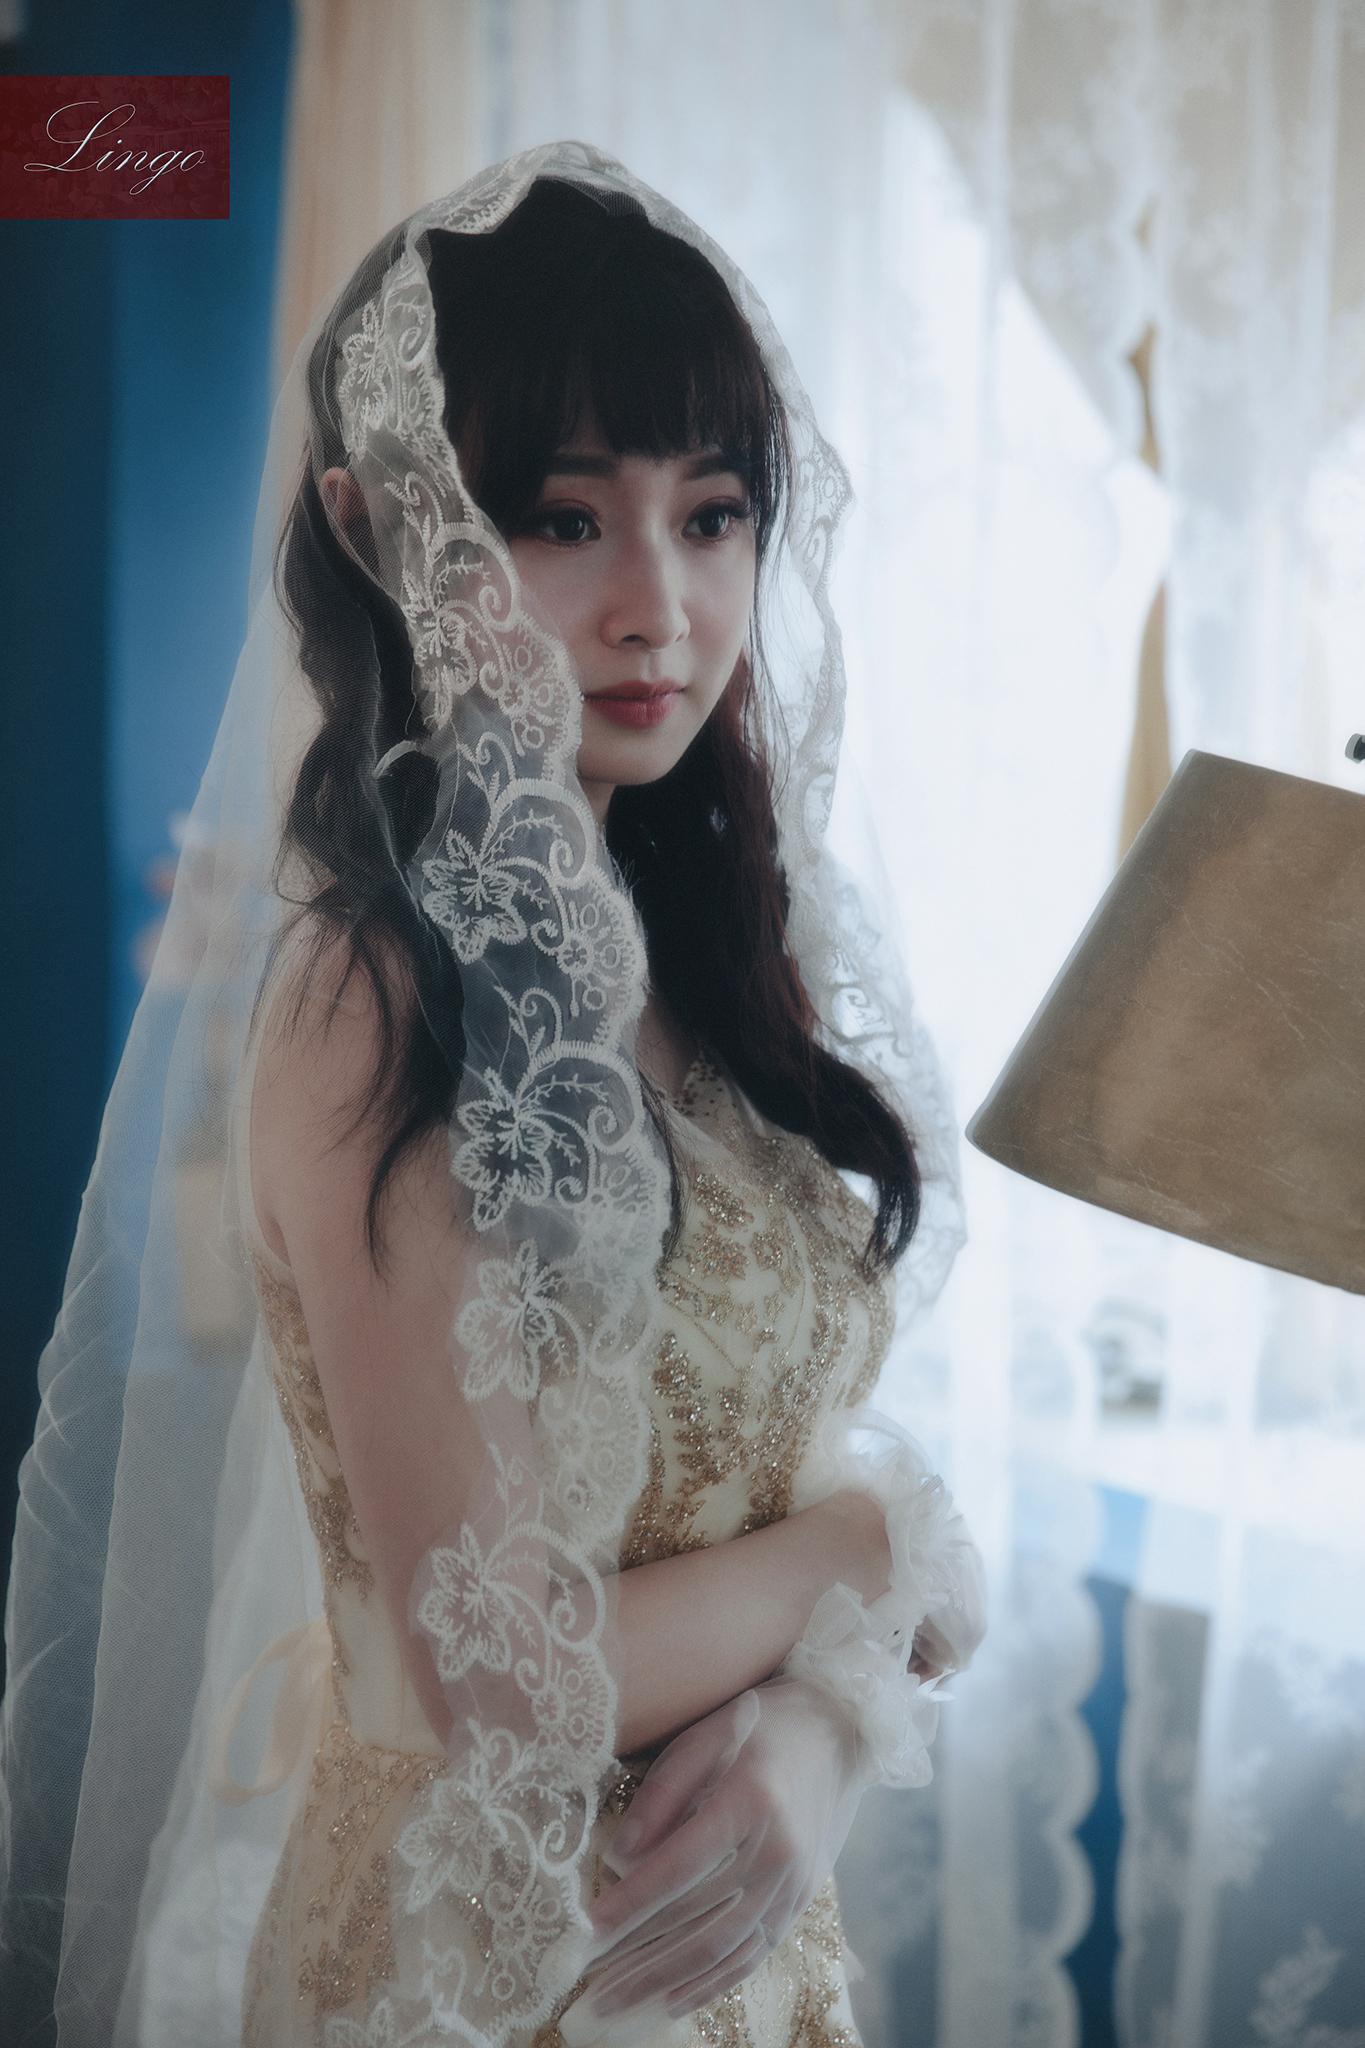 Lingo image_個人閨蜜婚紗7